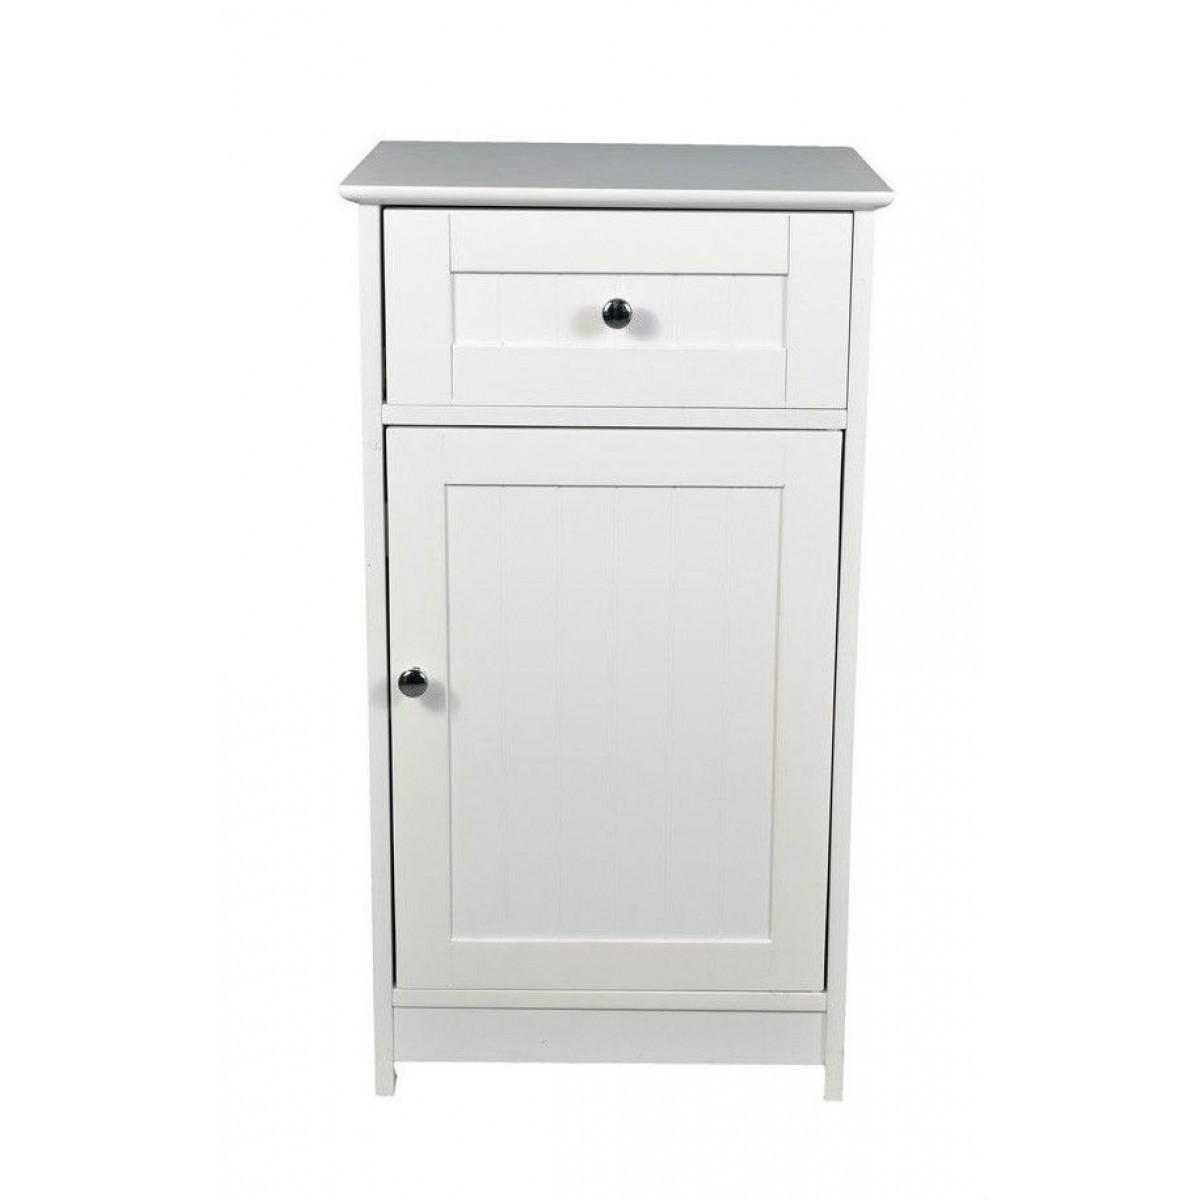 Alaska White 1 Door 1 Drawer Bathroom Floor Storage Cabinet Home Done within measurements 1200 X 1200